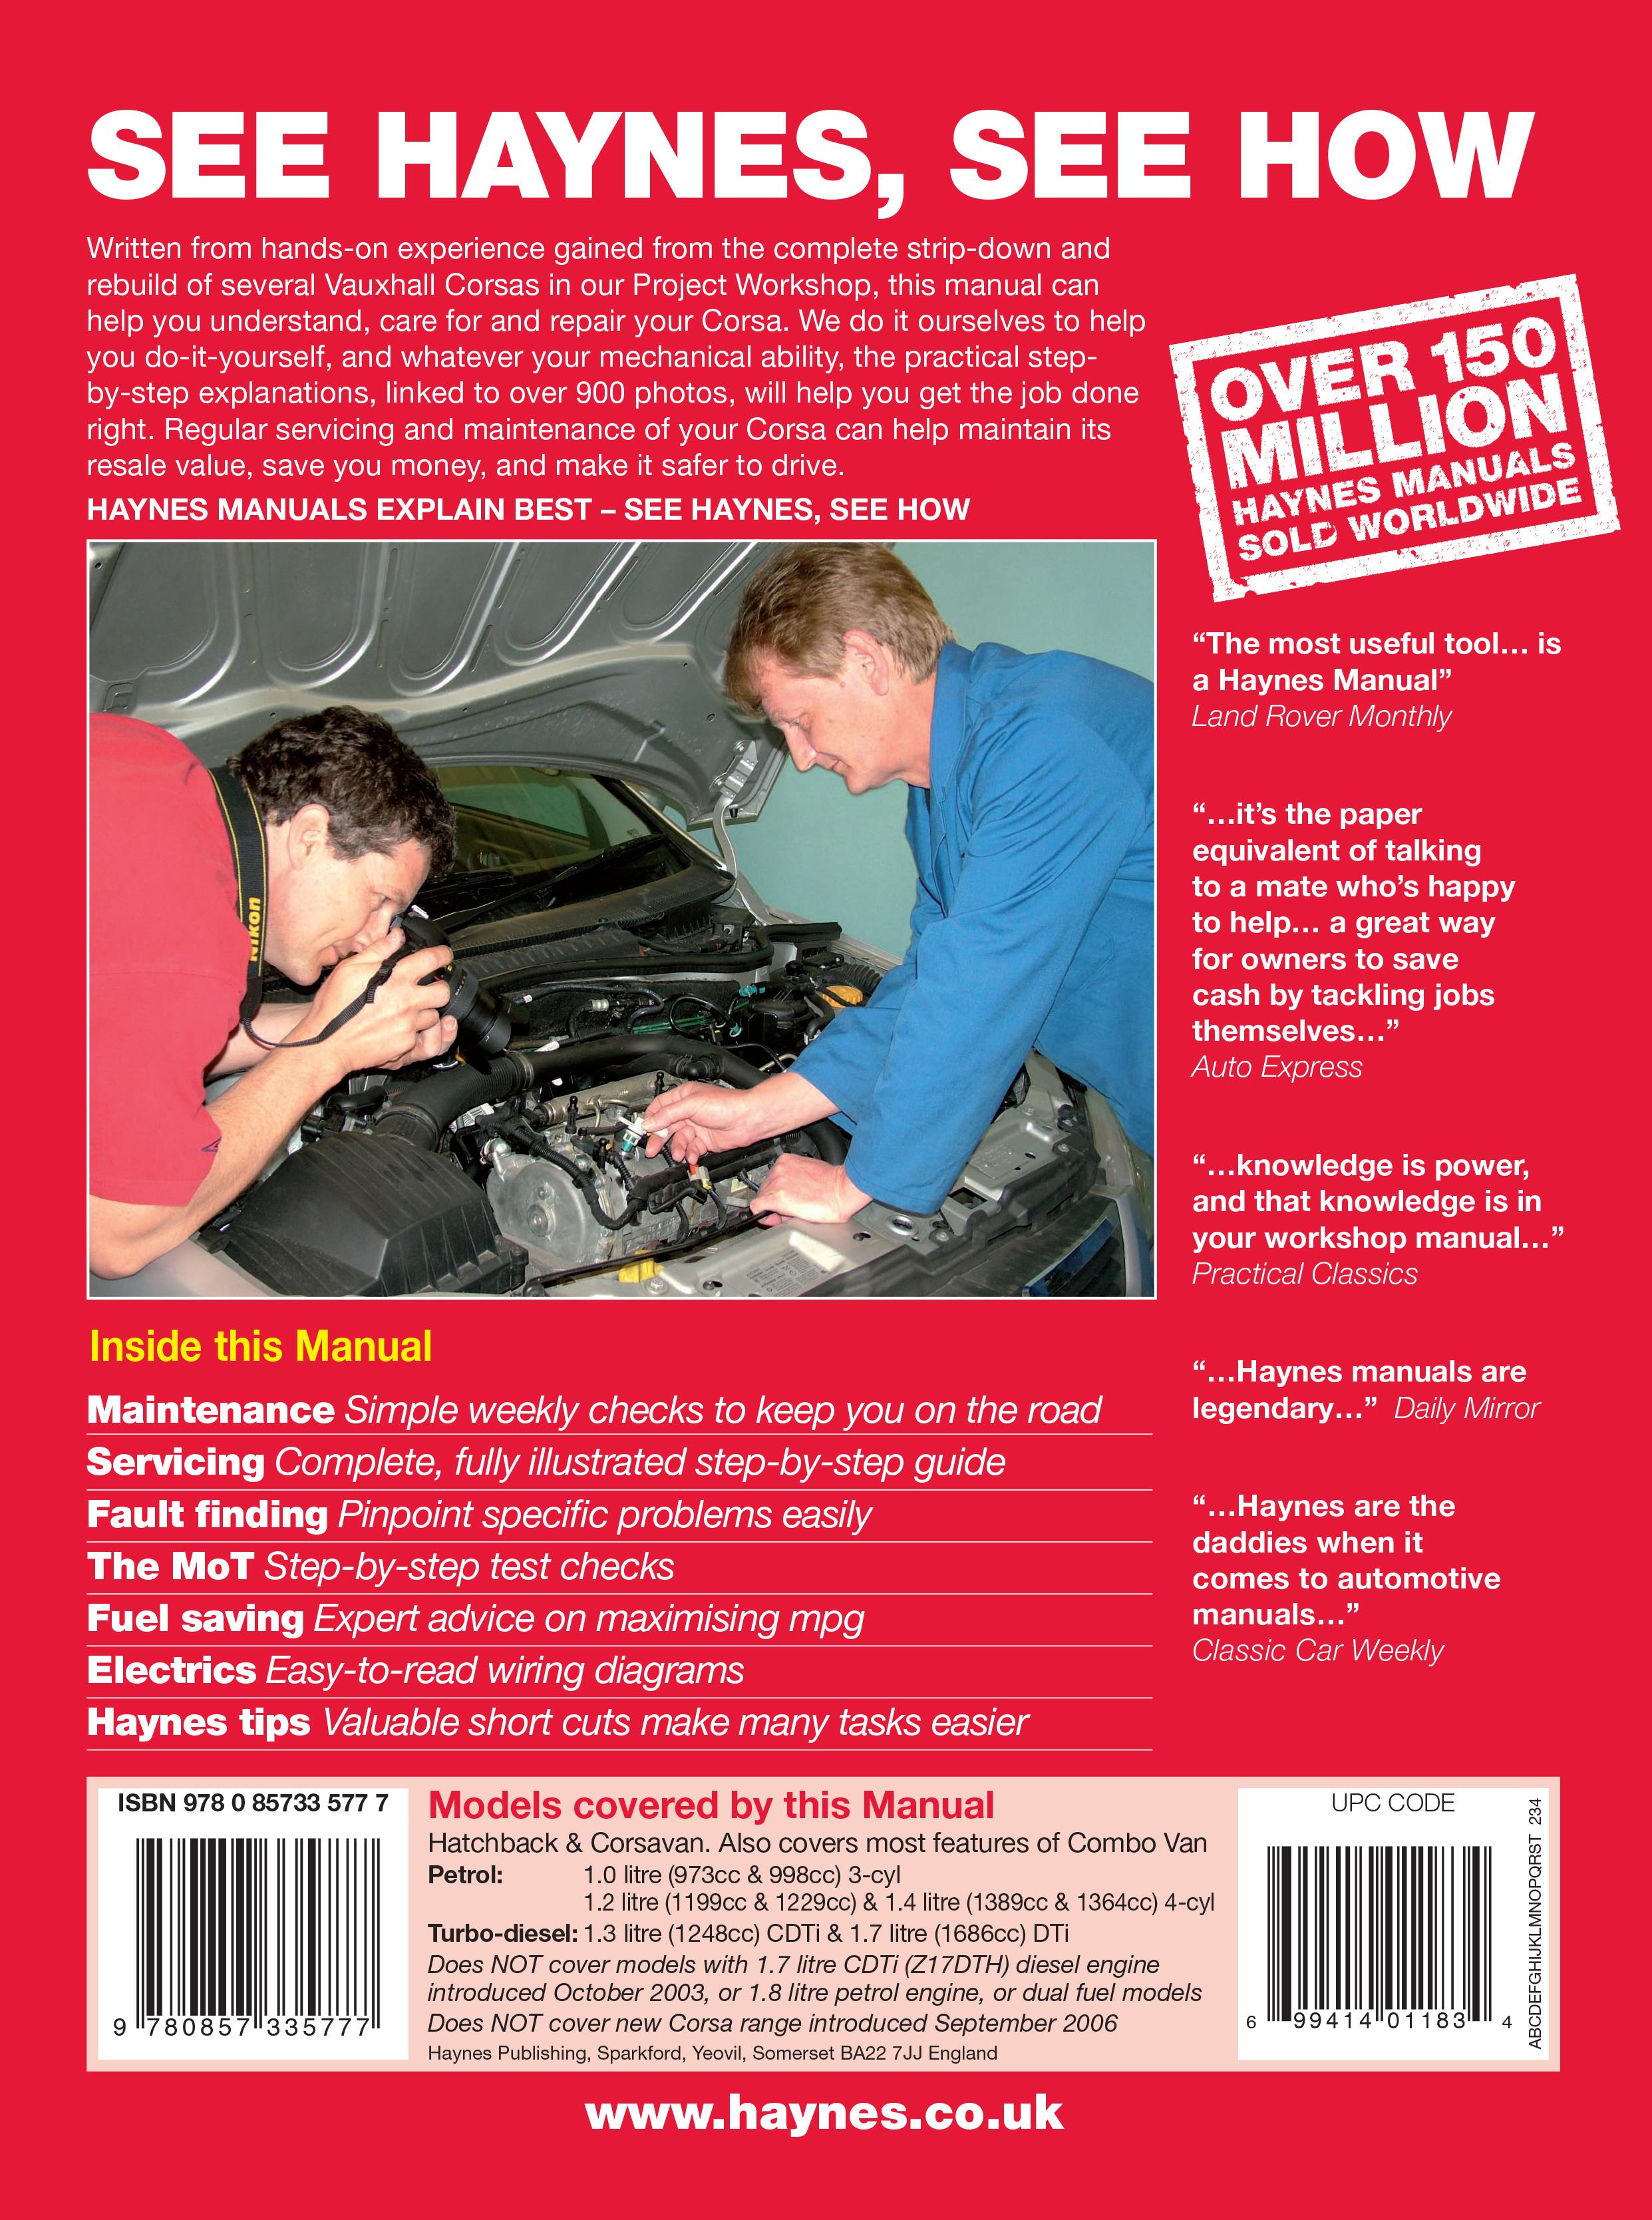 vauxhall corsa service manual pdf